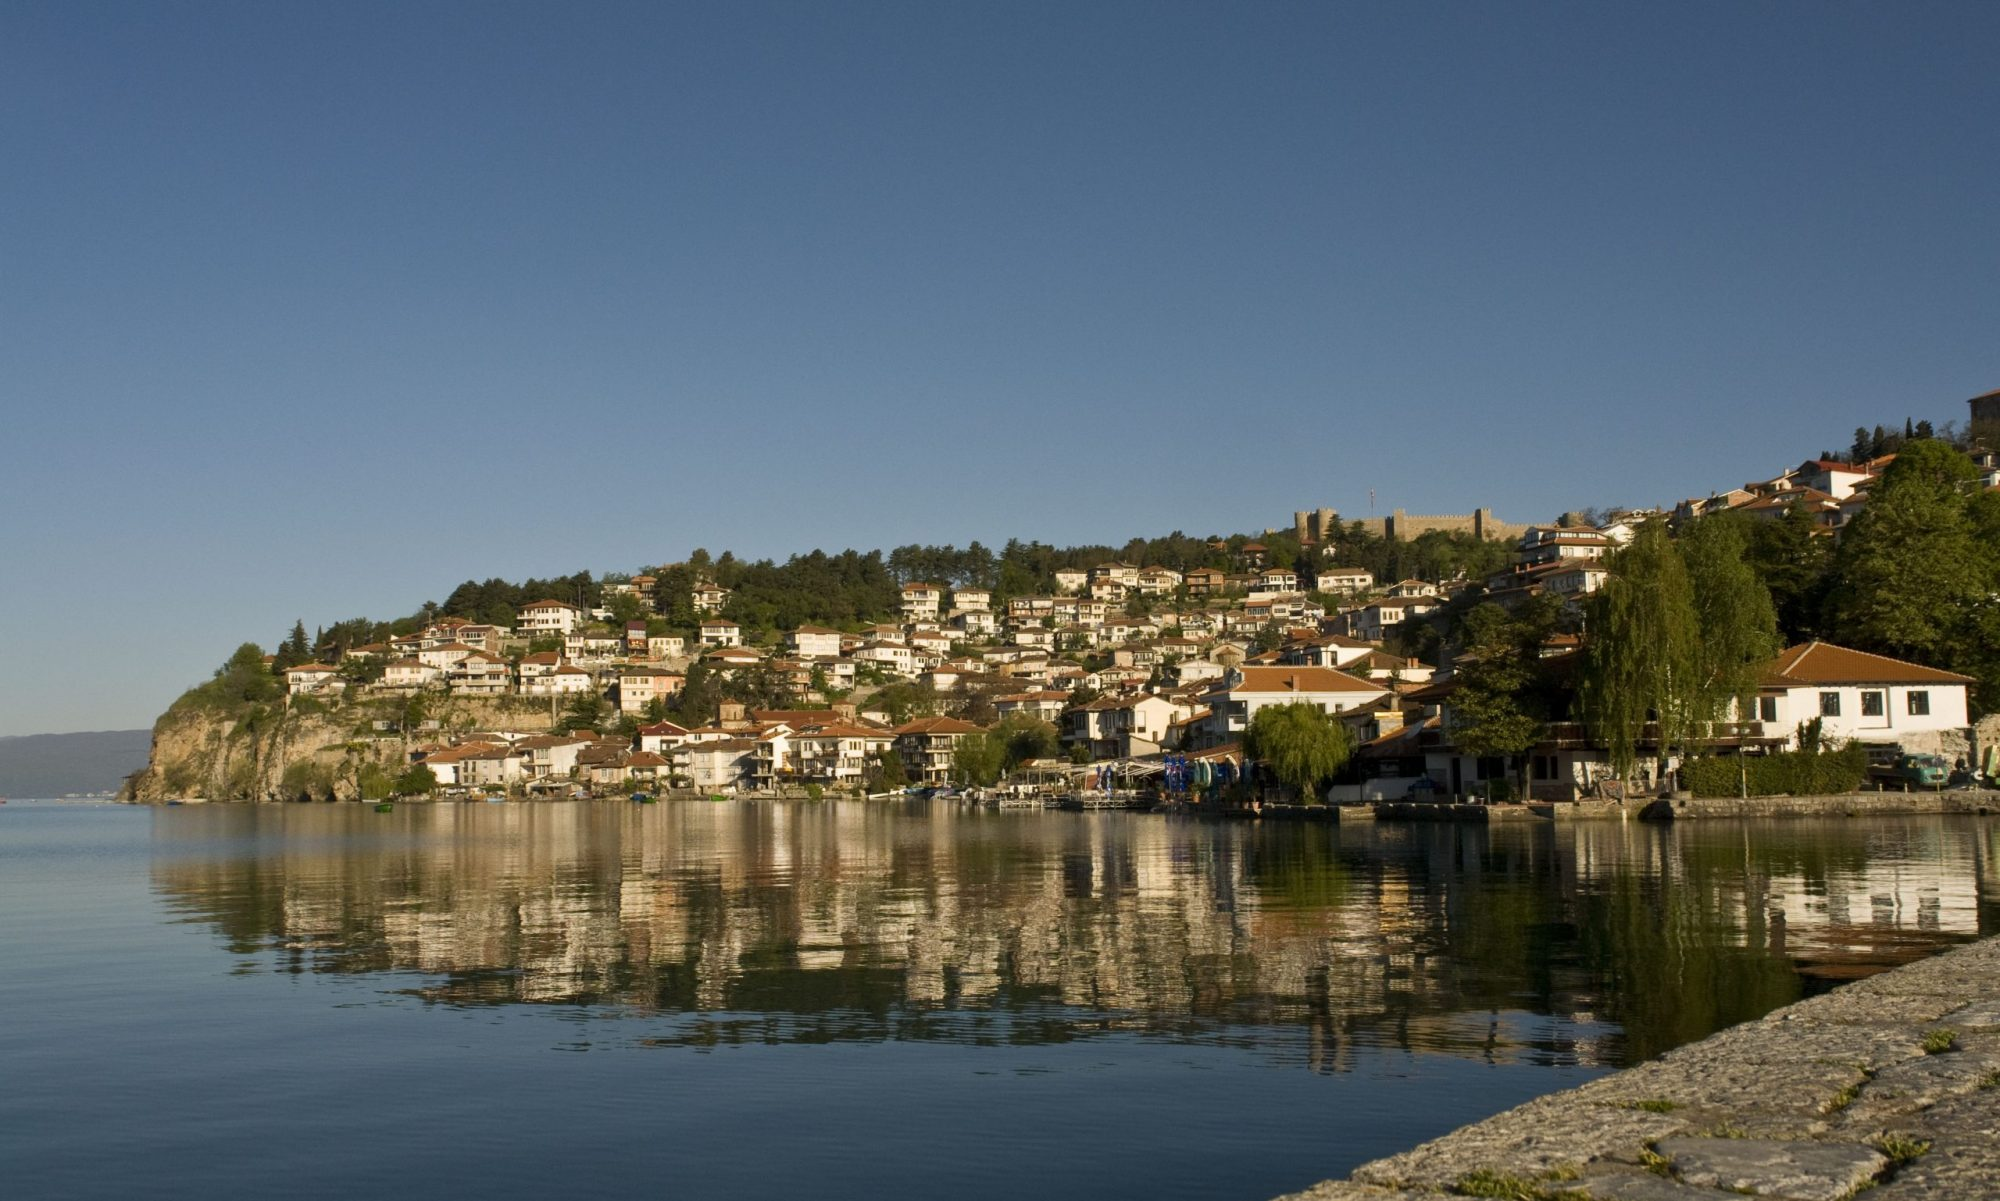 City of Ohrid